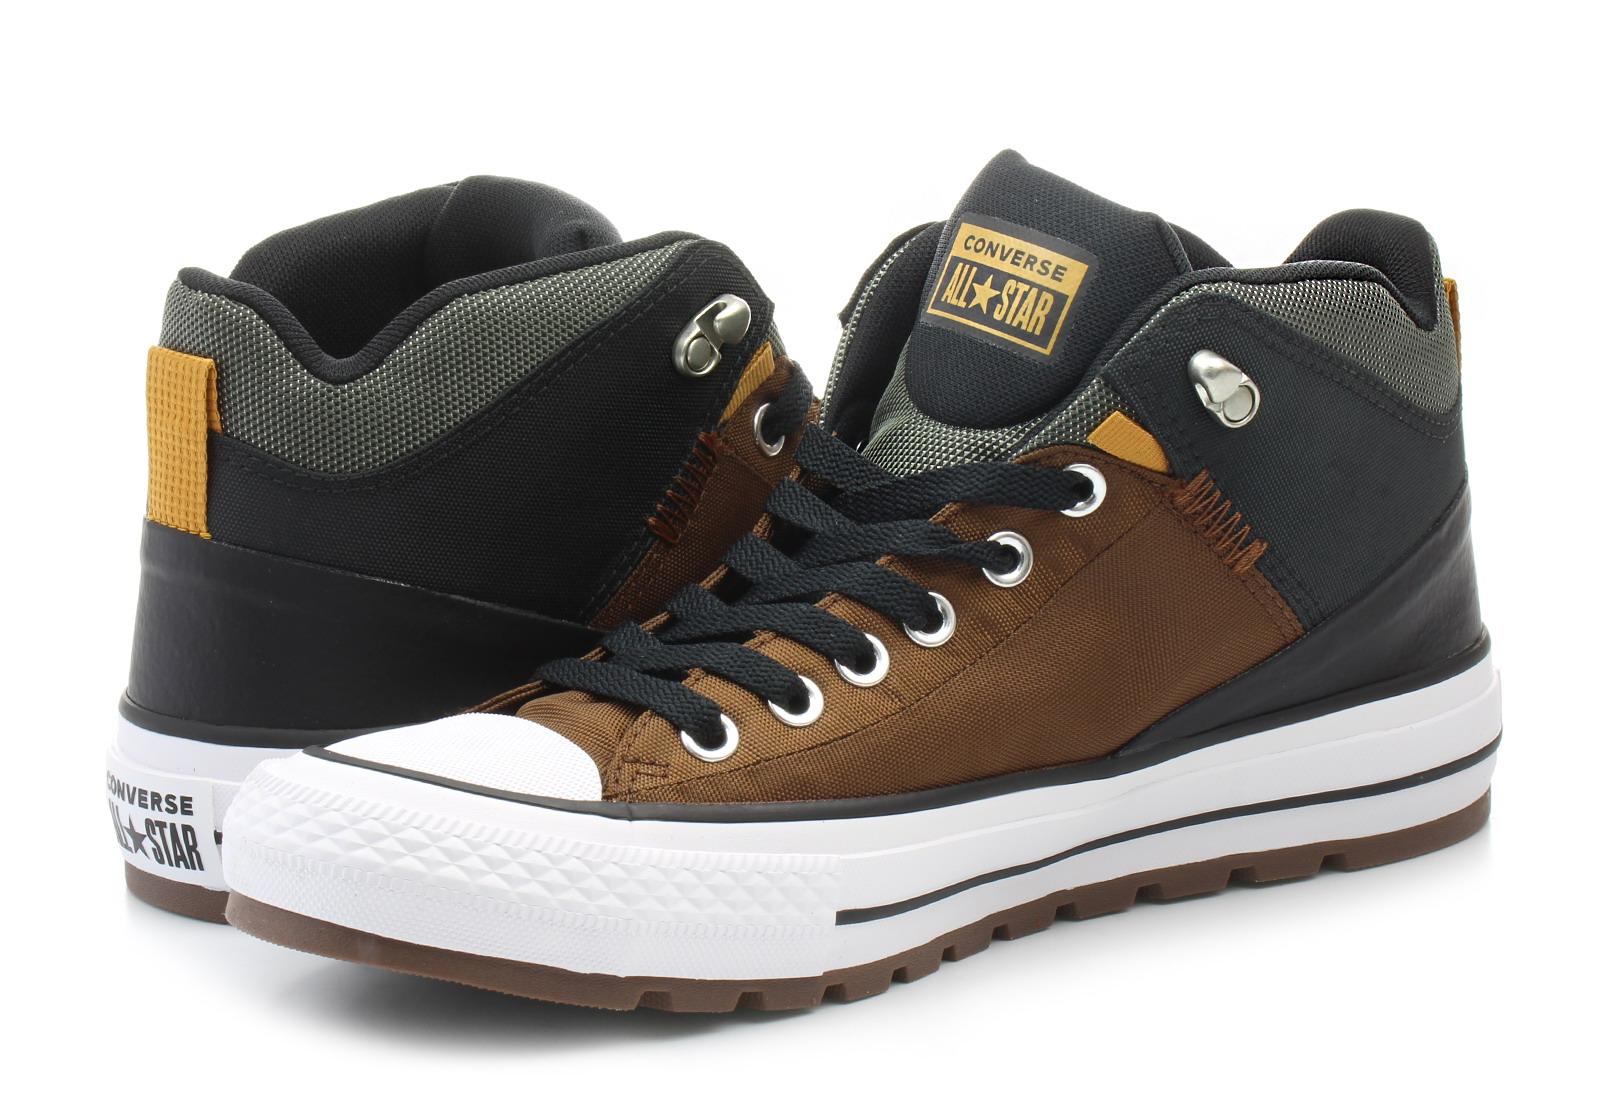 b7f9c2c100cf72 Converse Sneakers - Chuck Taylor All Star Street Boot Hi - 161469C ...